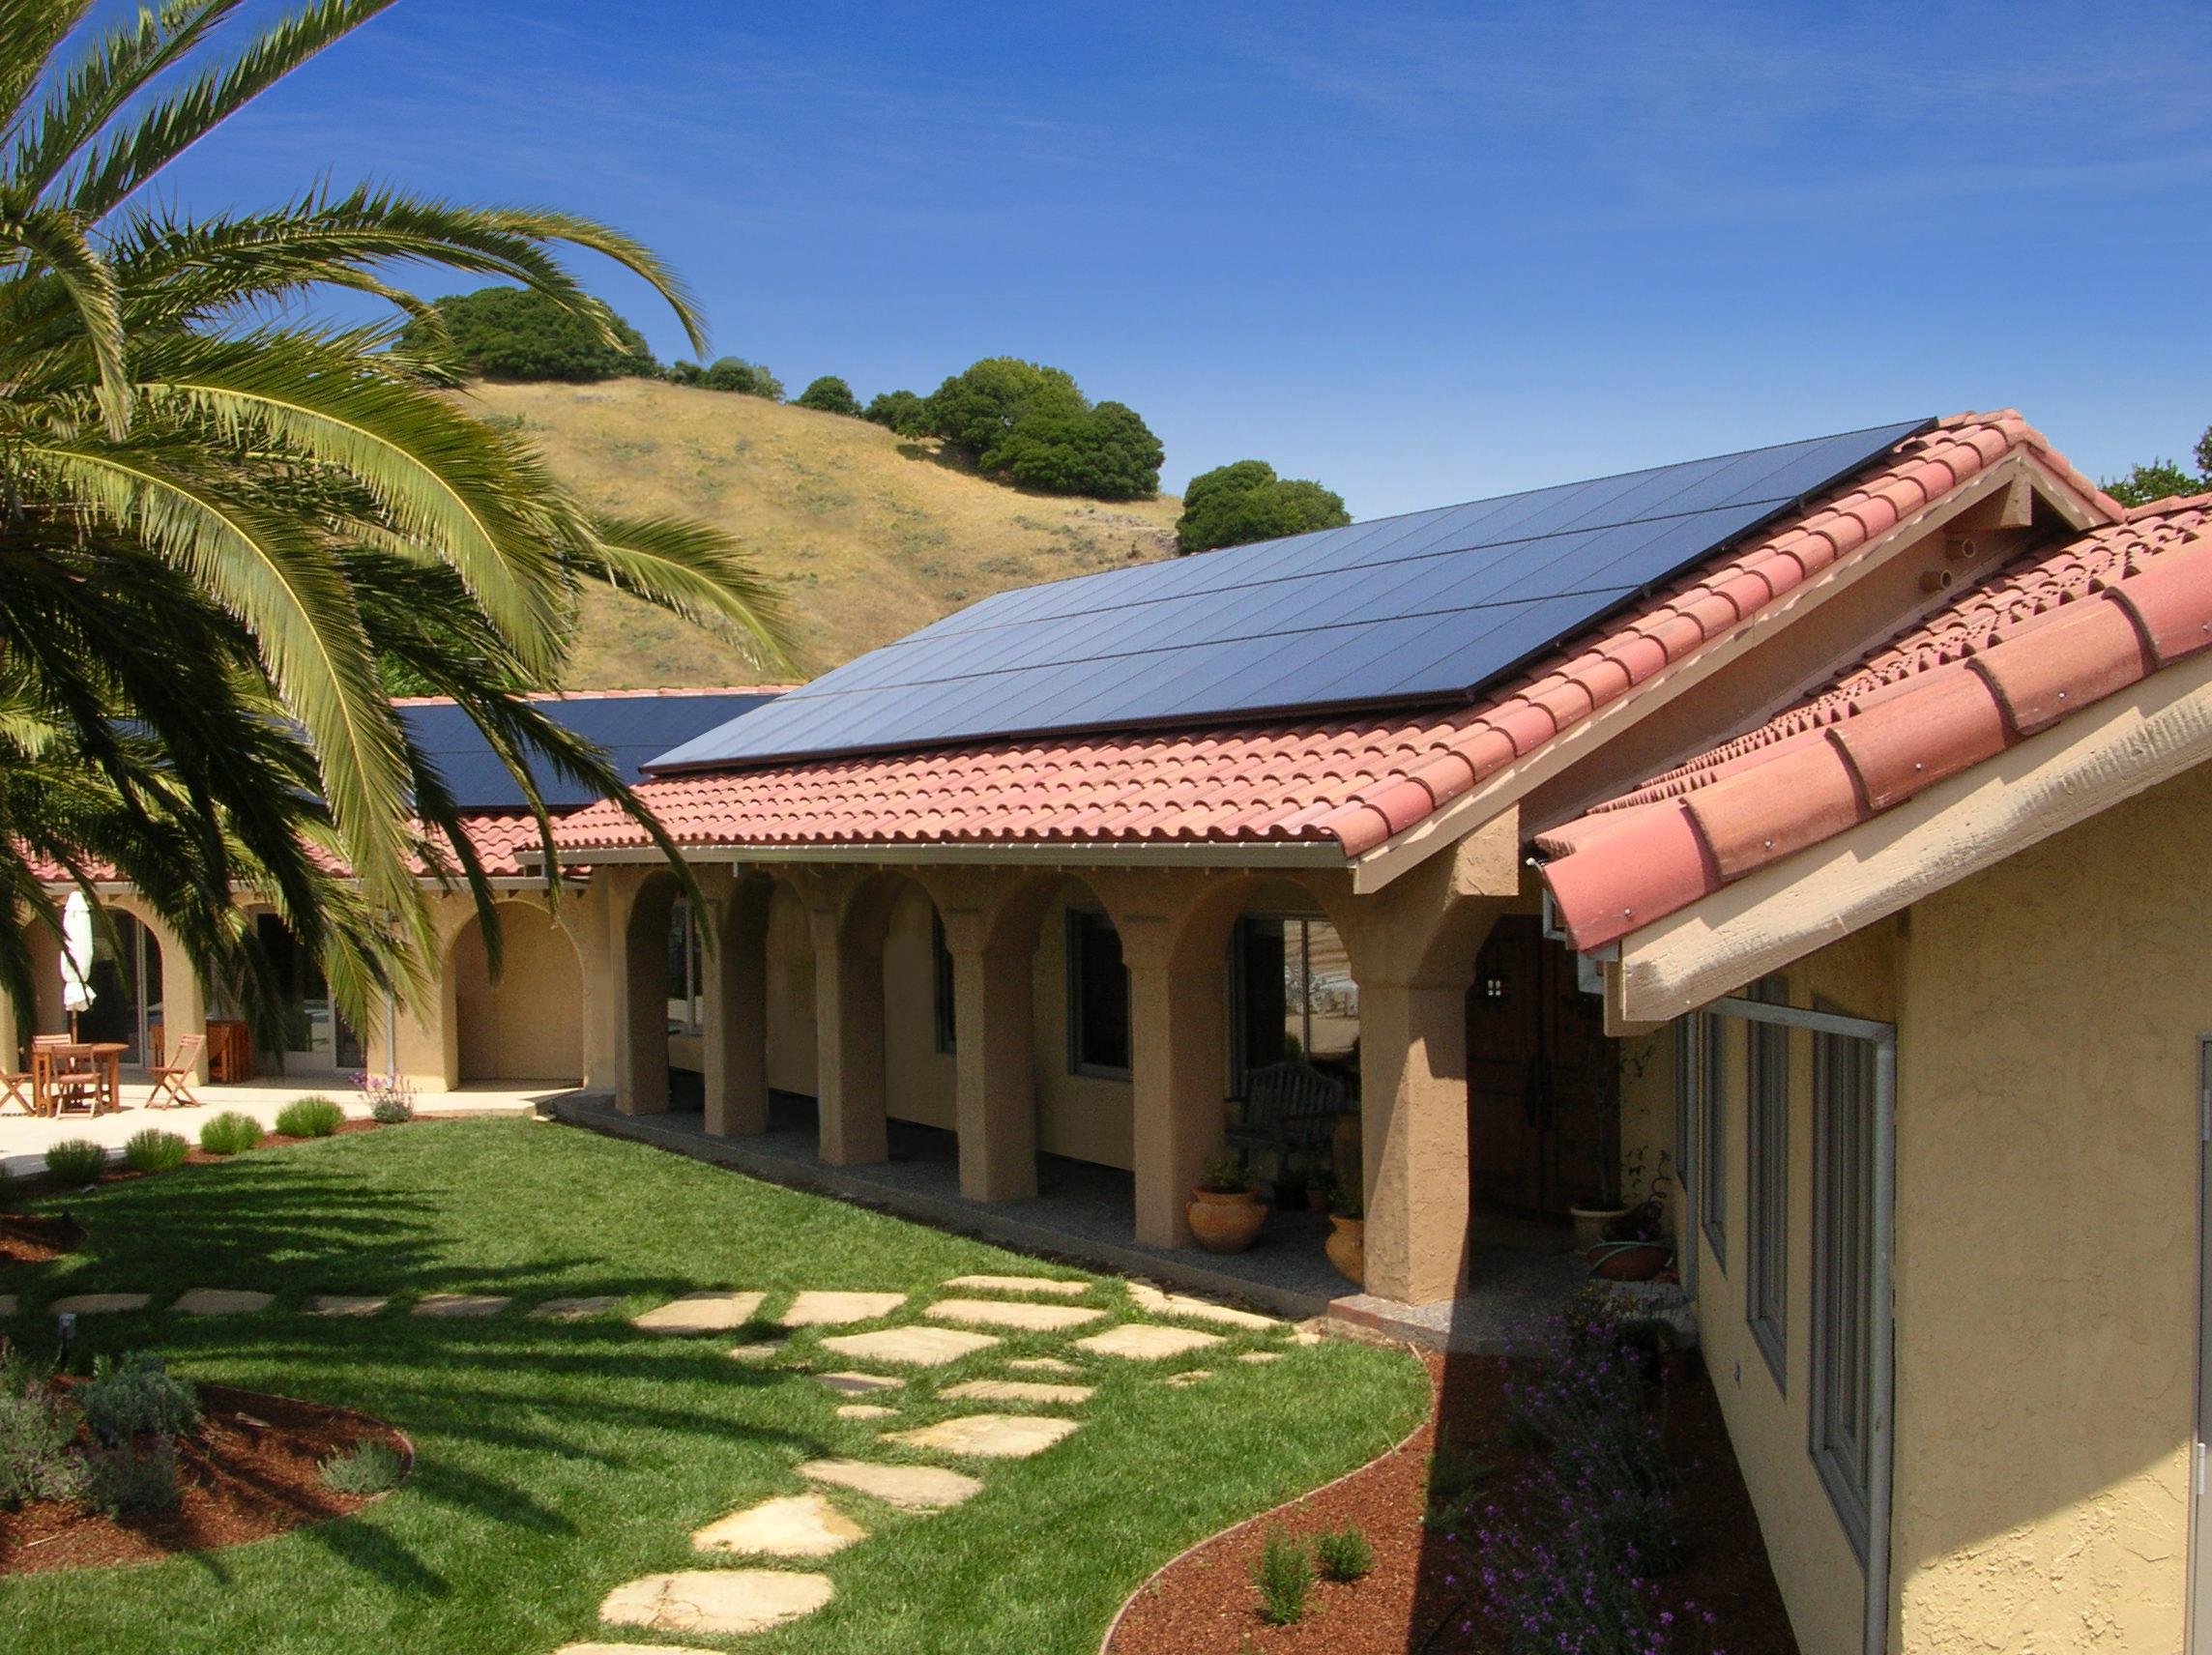 A residential solar installation by SunPower.